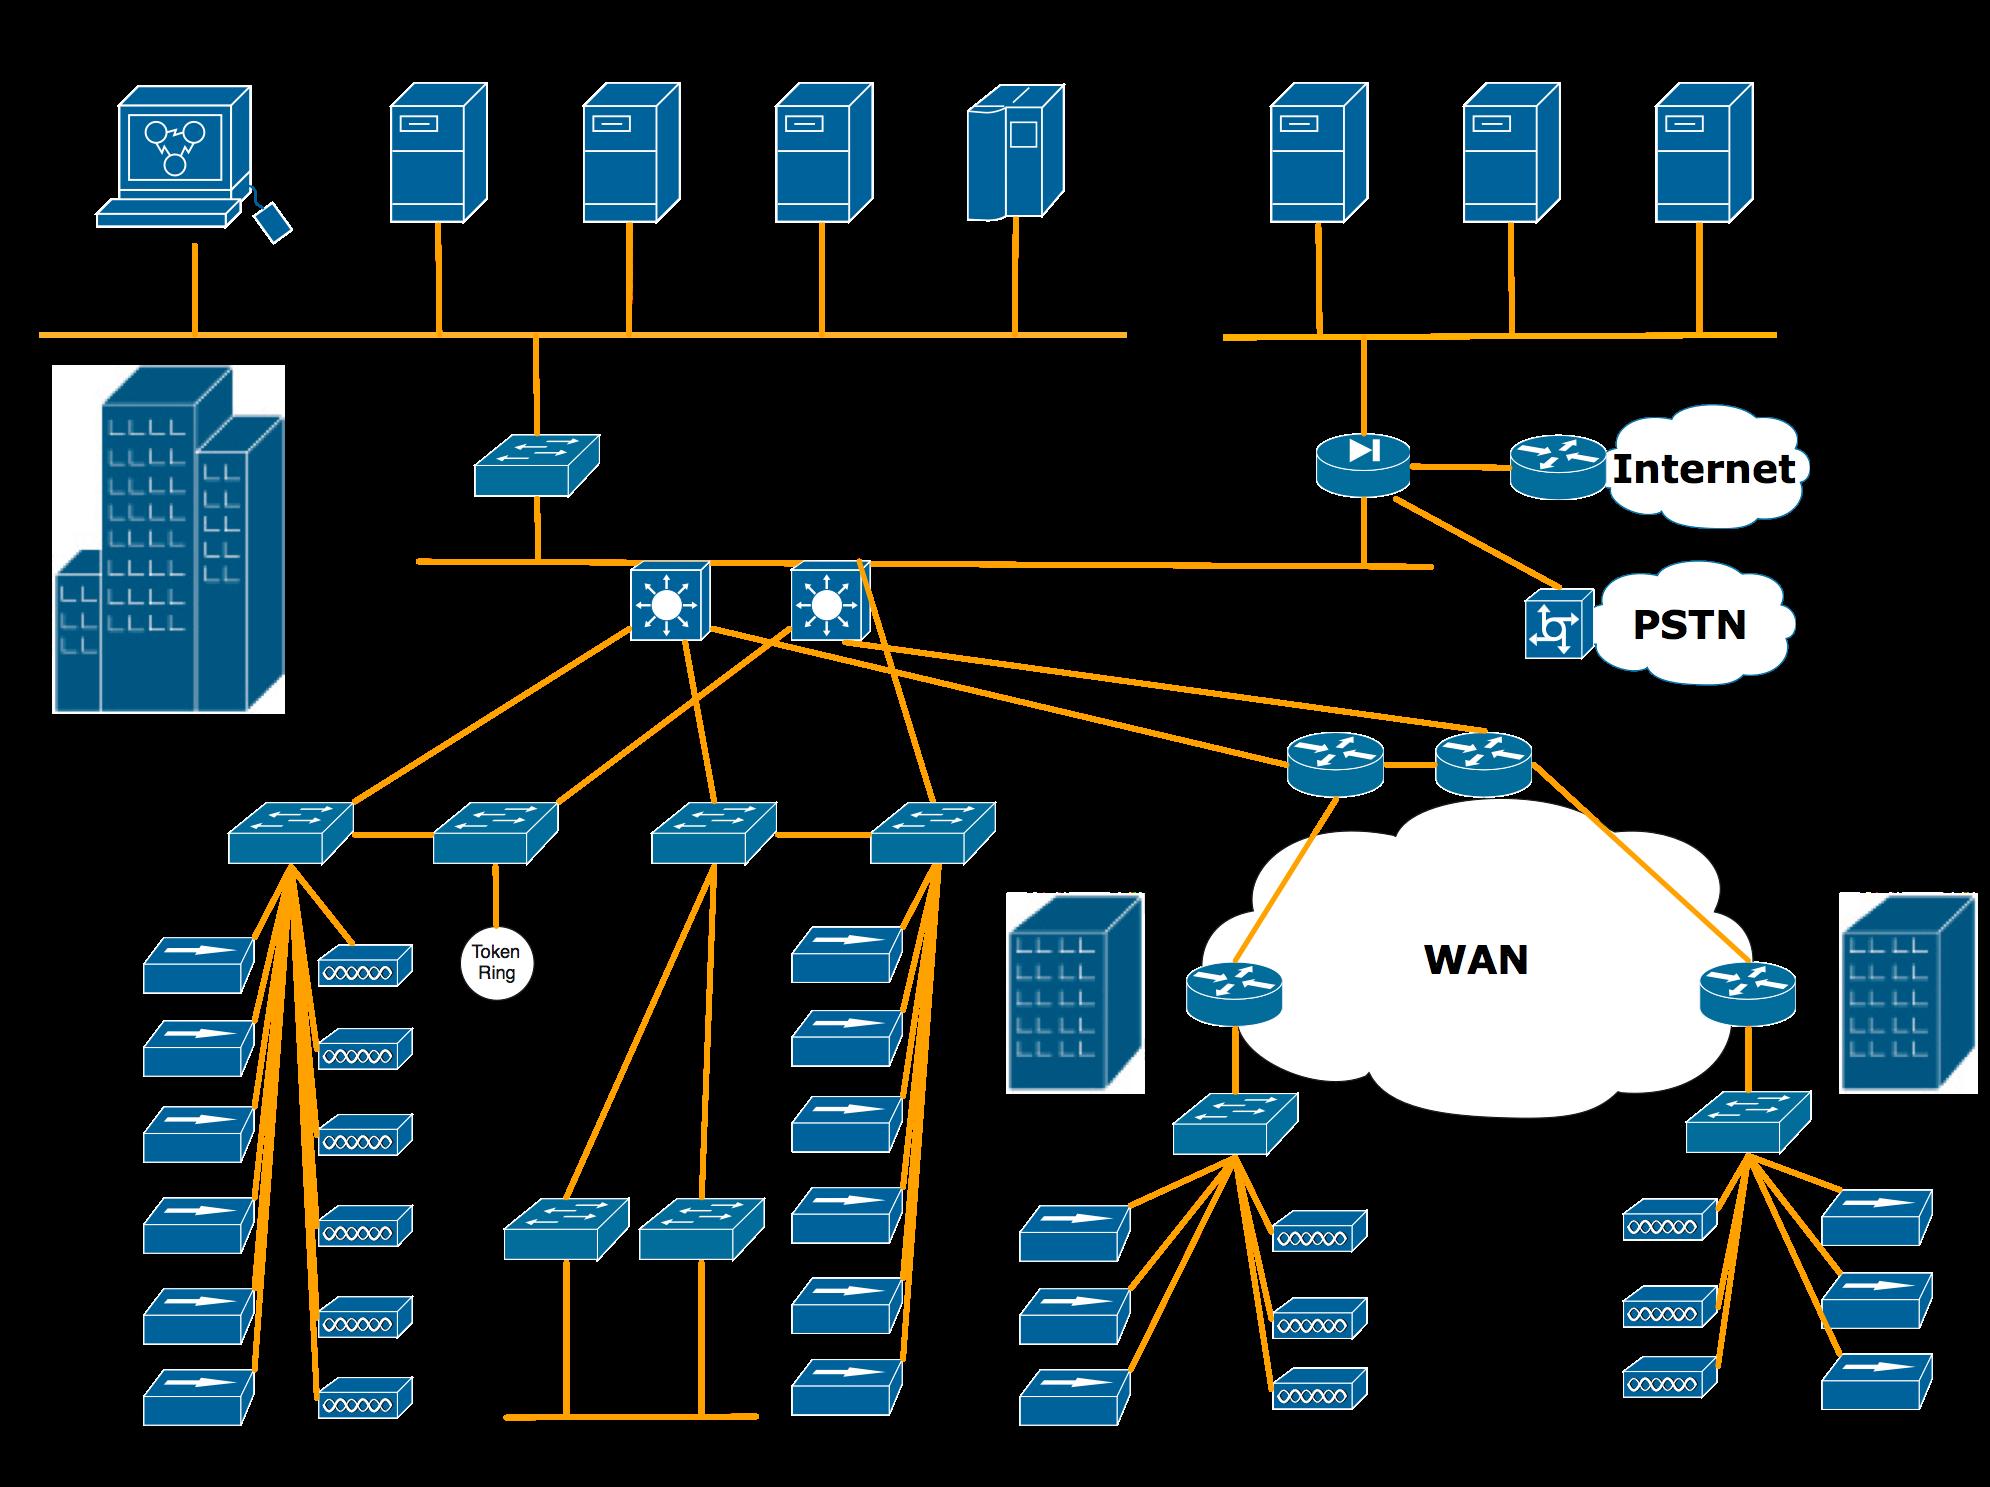 network diagram [ 1990 x 1487 Pixel ]